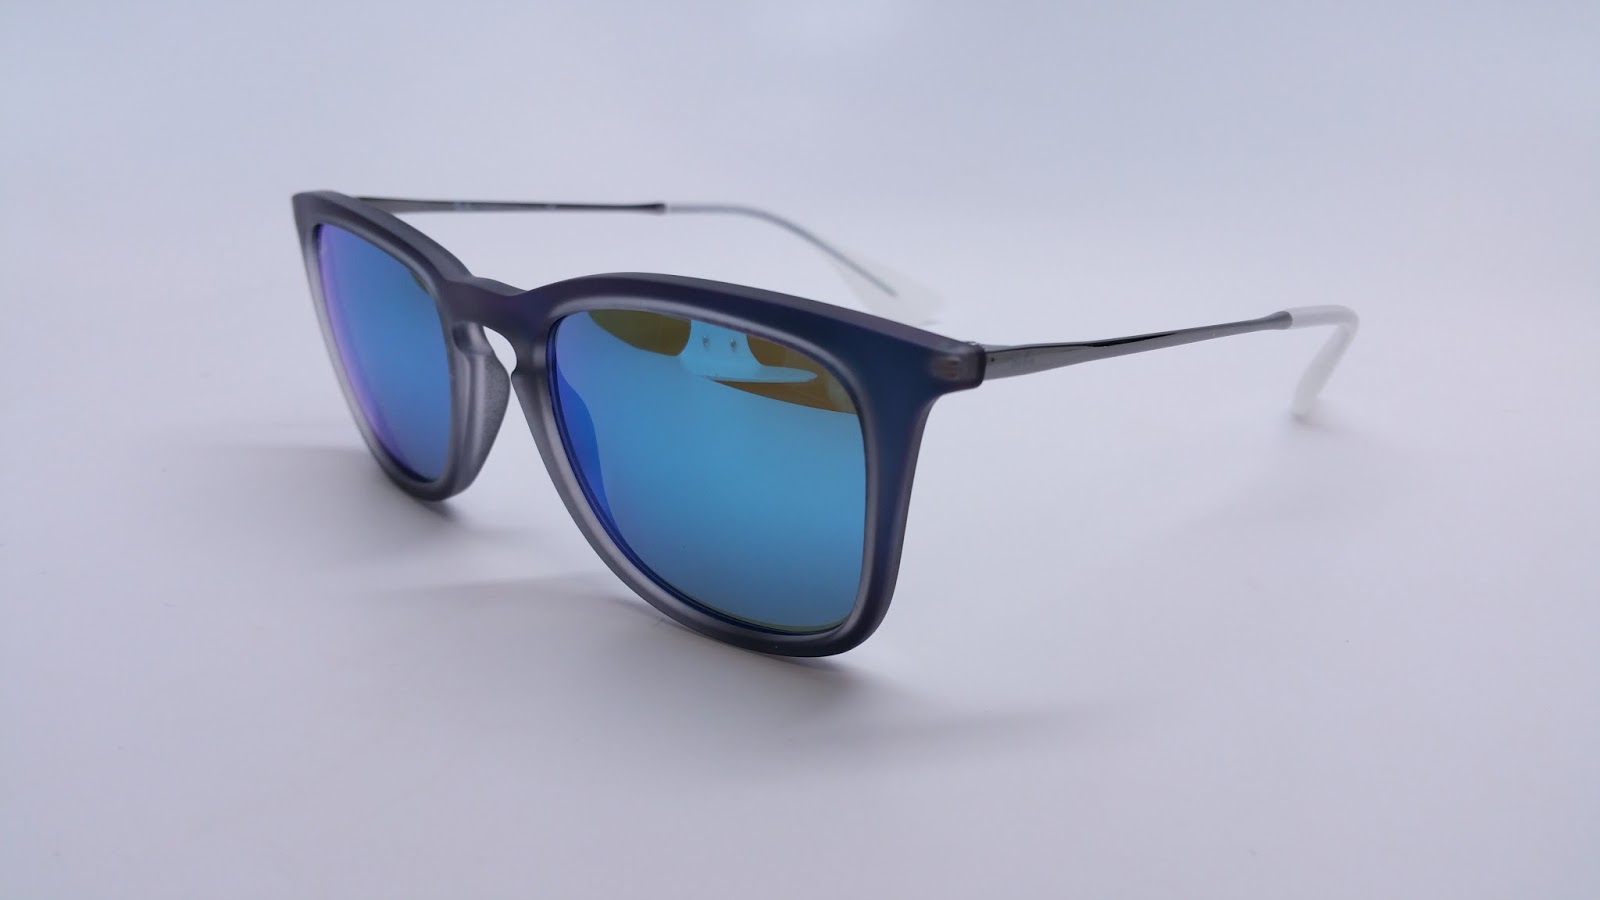 Ray Ban Rb 4221 6170 55 Shot Blue Rubber Sunglasses I